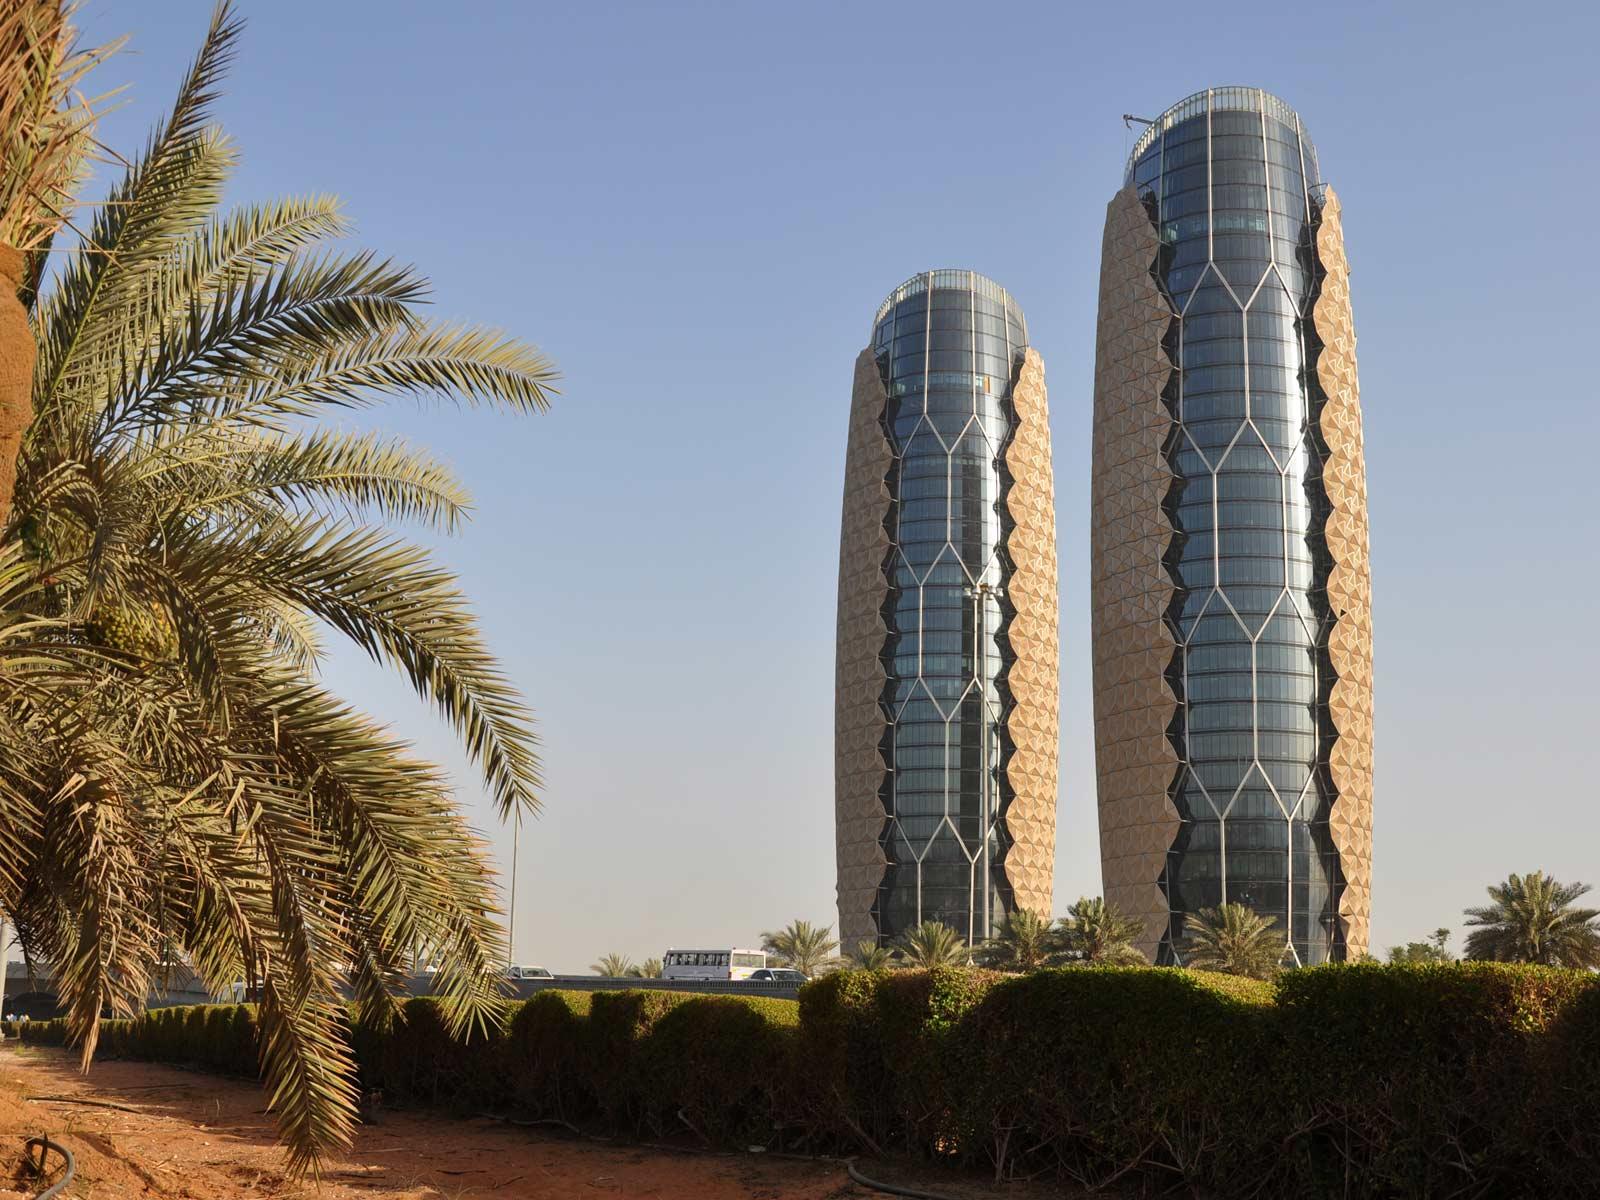 Al Bahr Towers башни, лучший небоскреб, Абу-Даби, ОАЭ